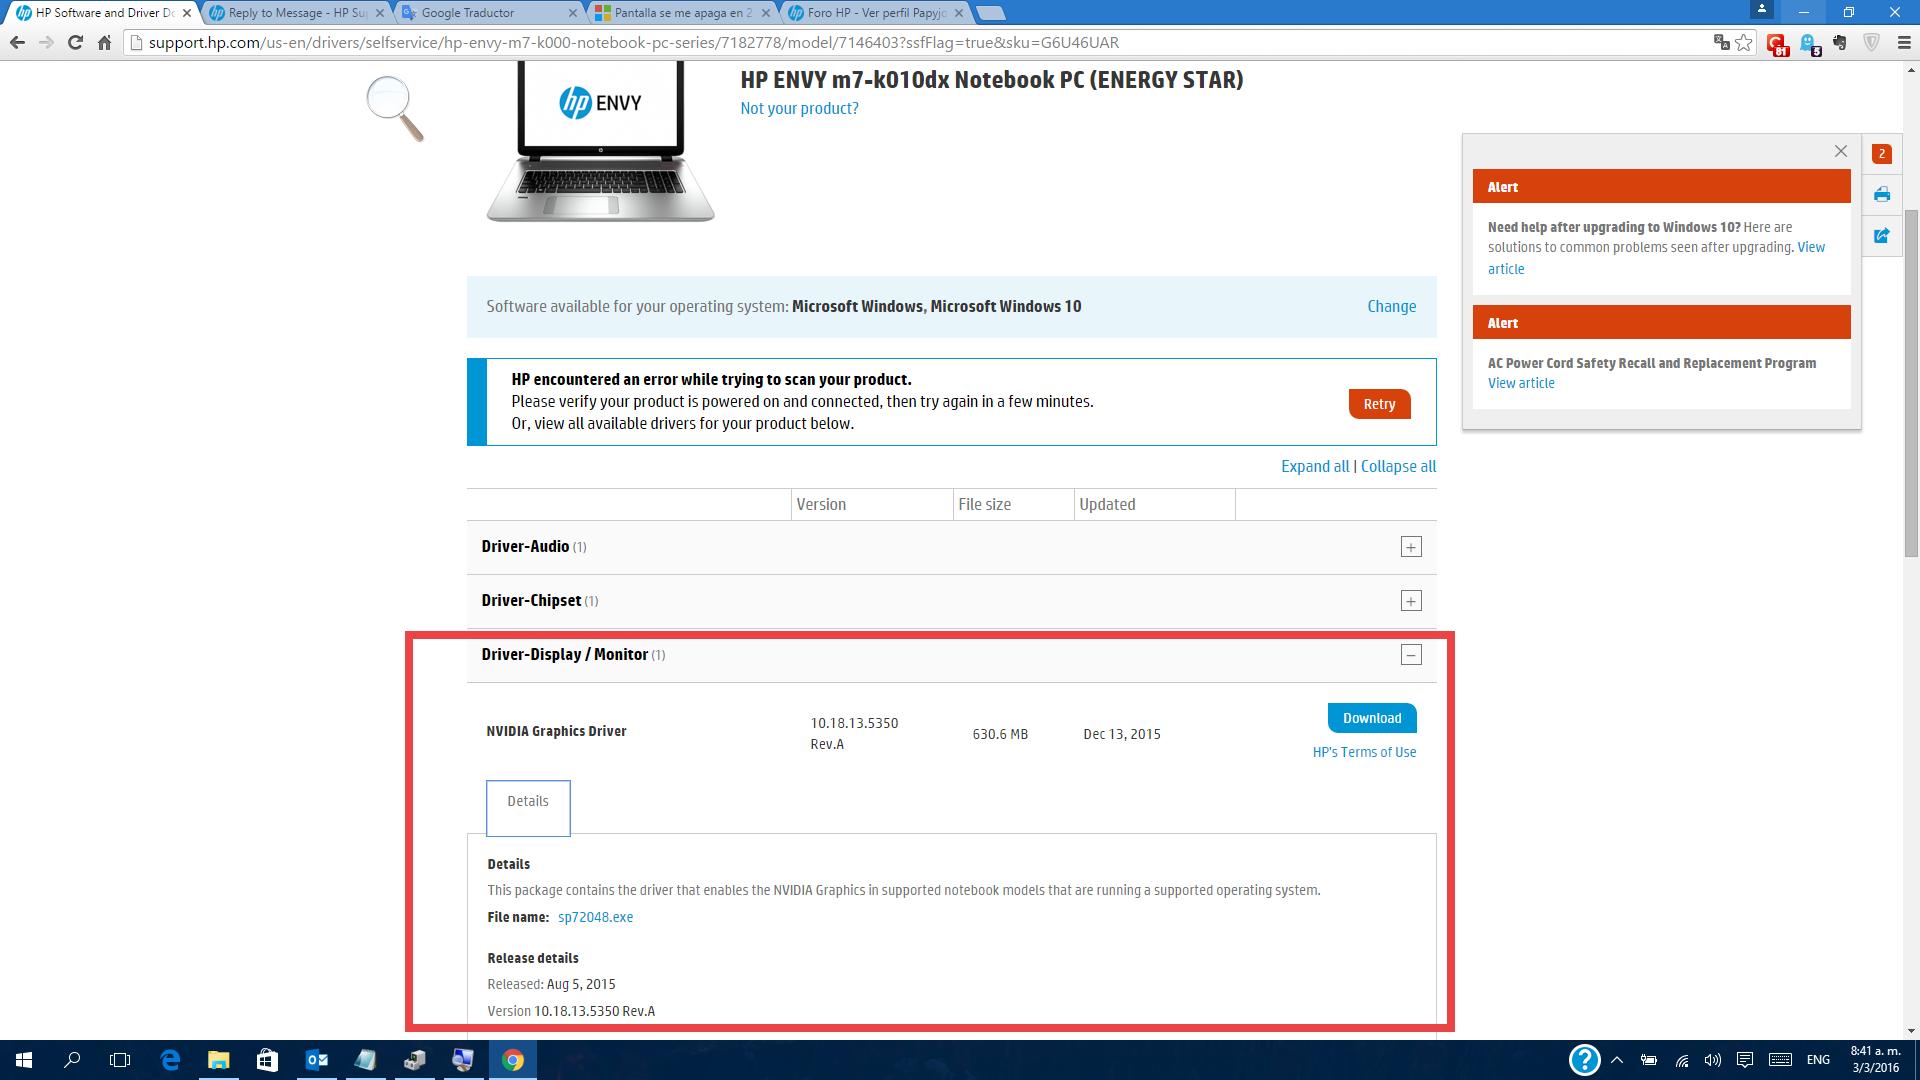 intel r hd graphics 4600 windows 8.1 64 bit